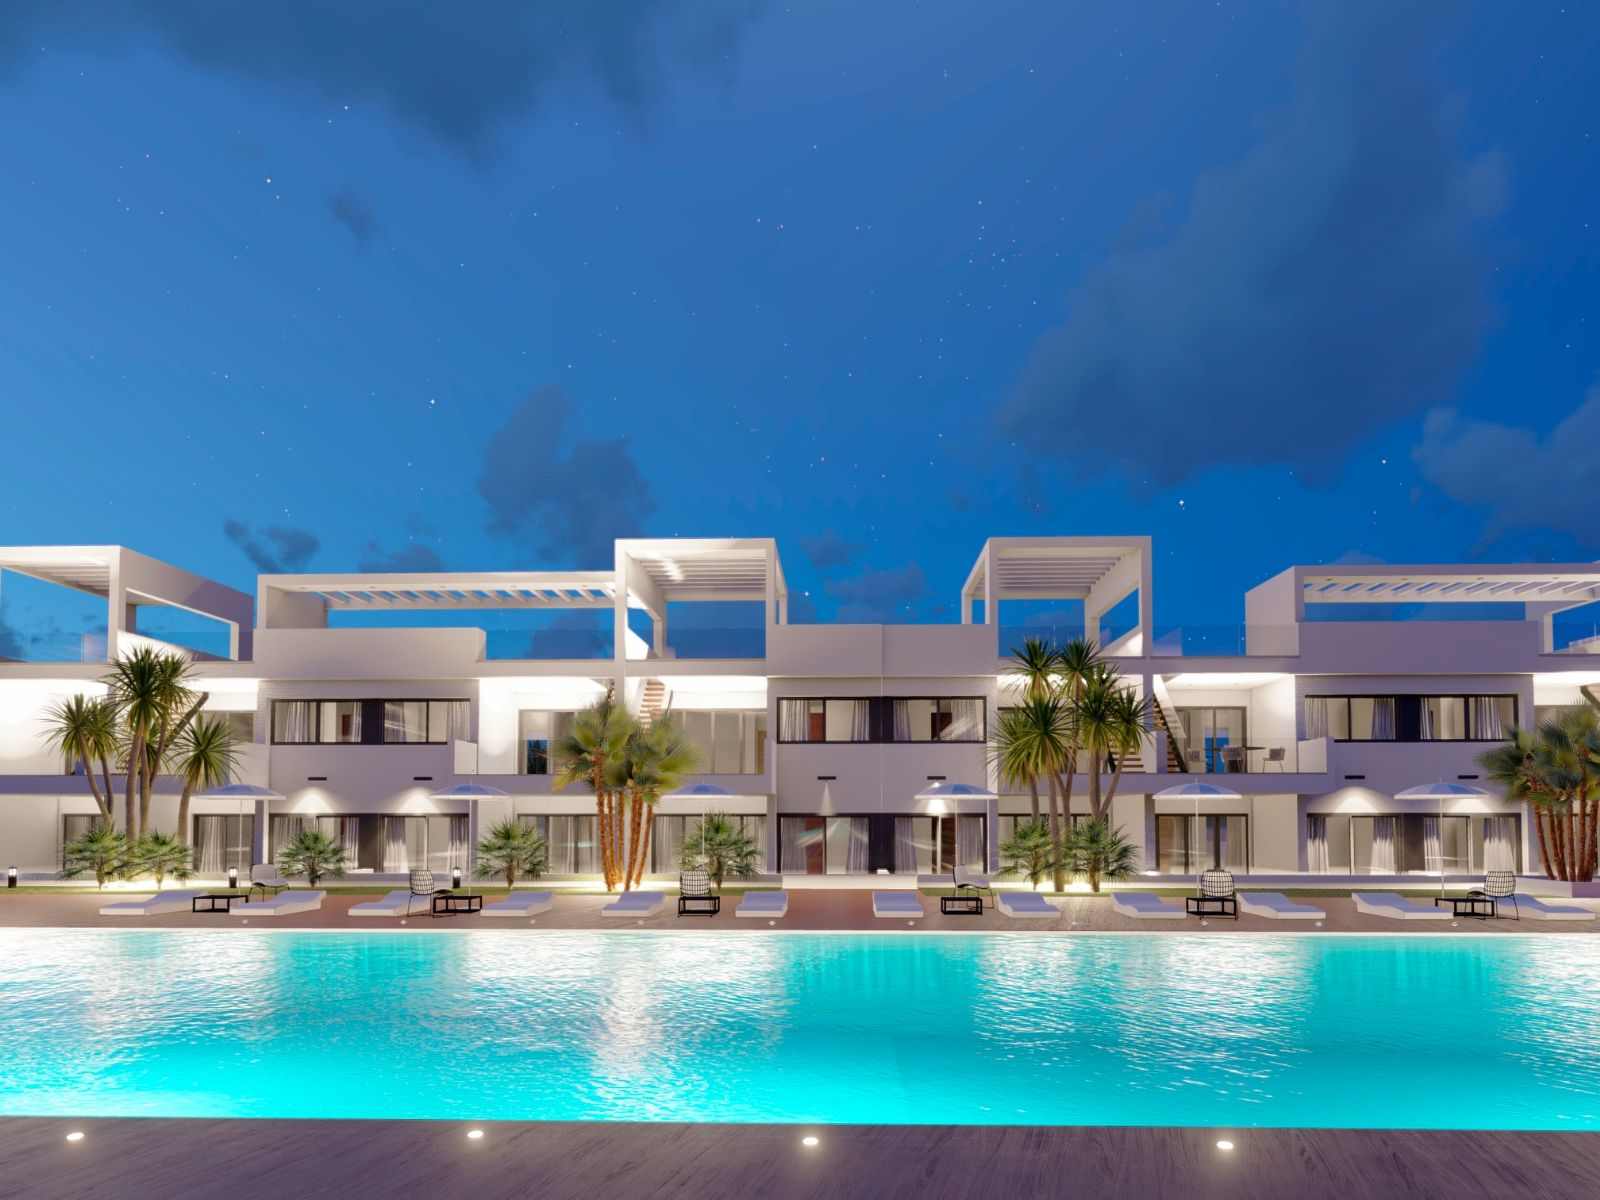 SPAIN COSTA BLANCA, Benidorm attractive new build apartments in a new resort with sea views